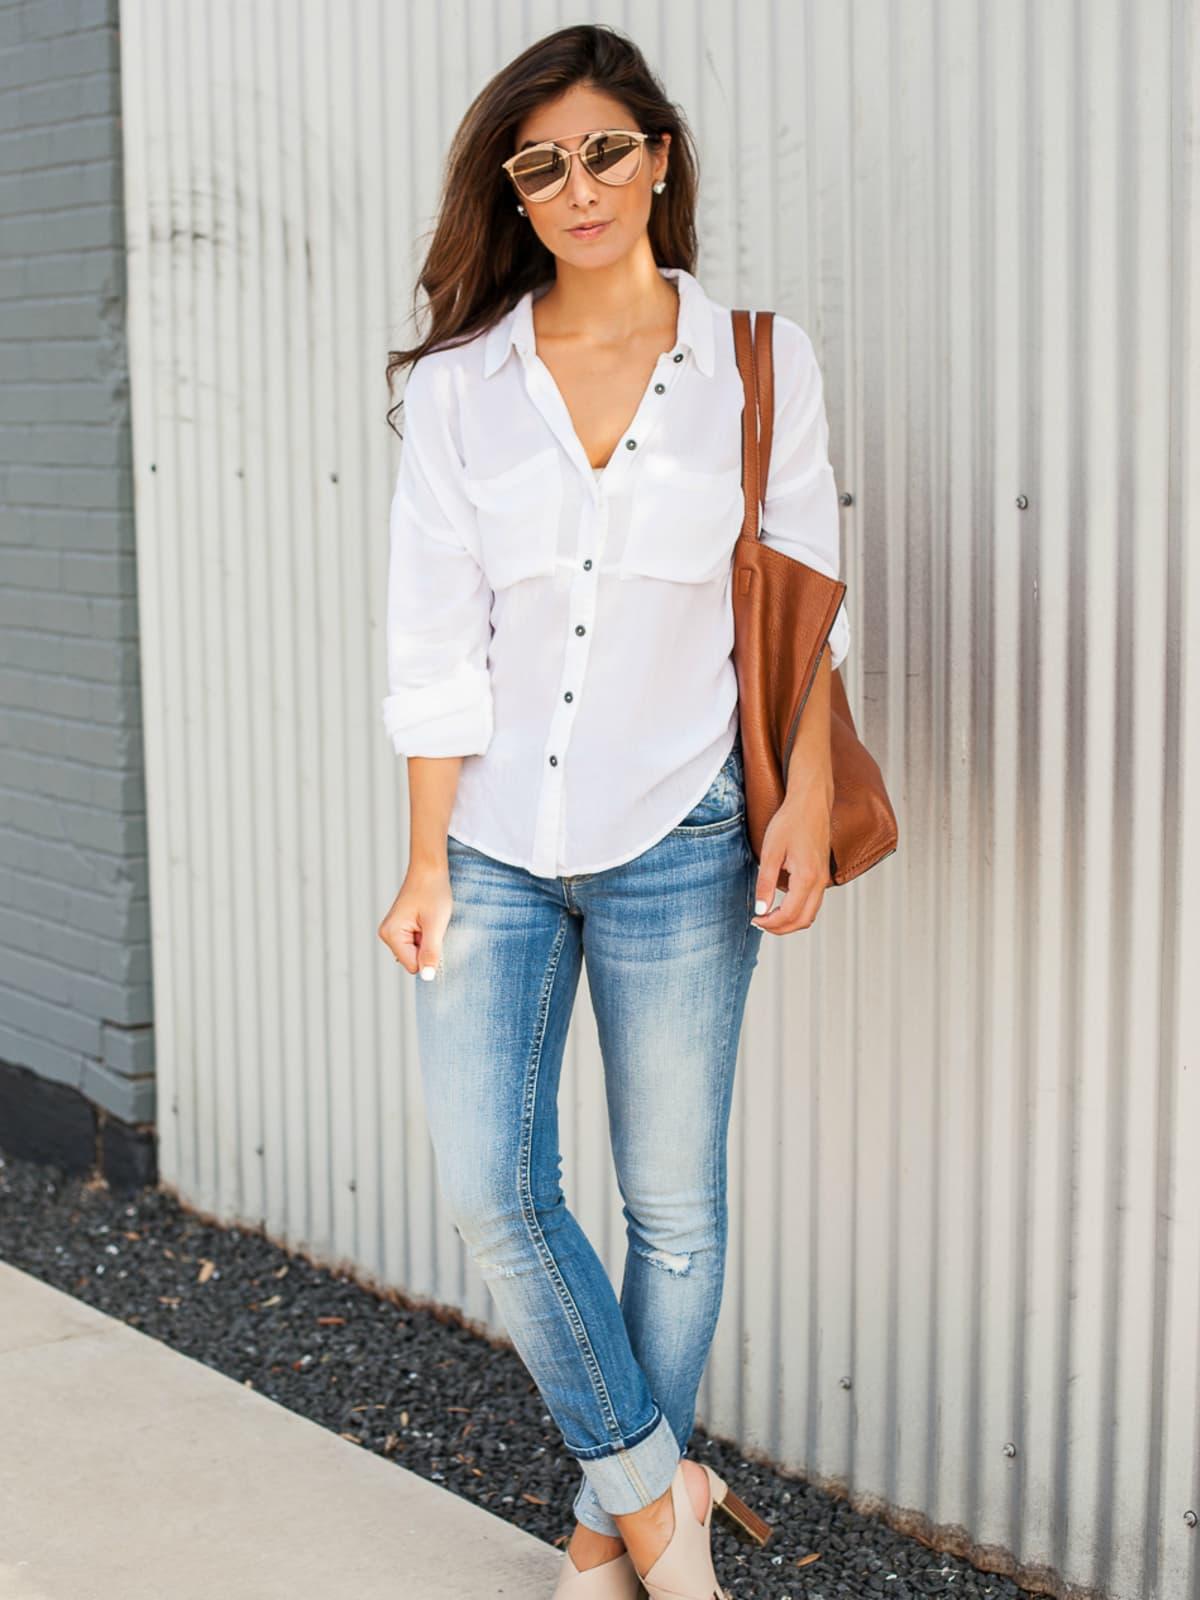 Austin Stylemaker 2015 Jessi Afshin